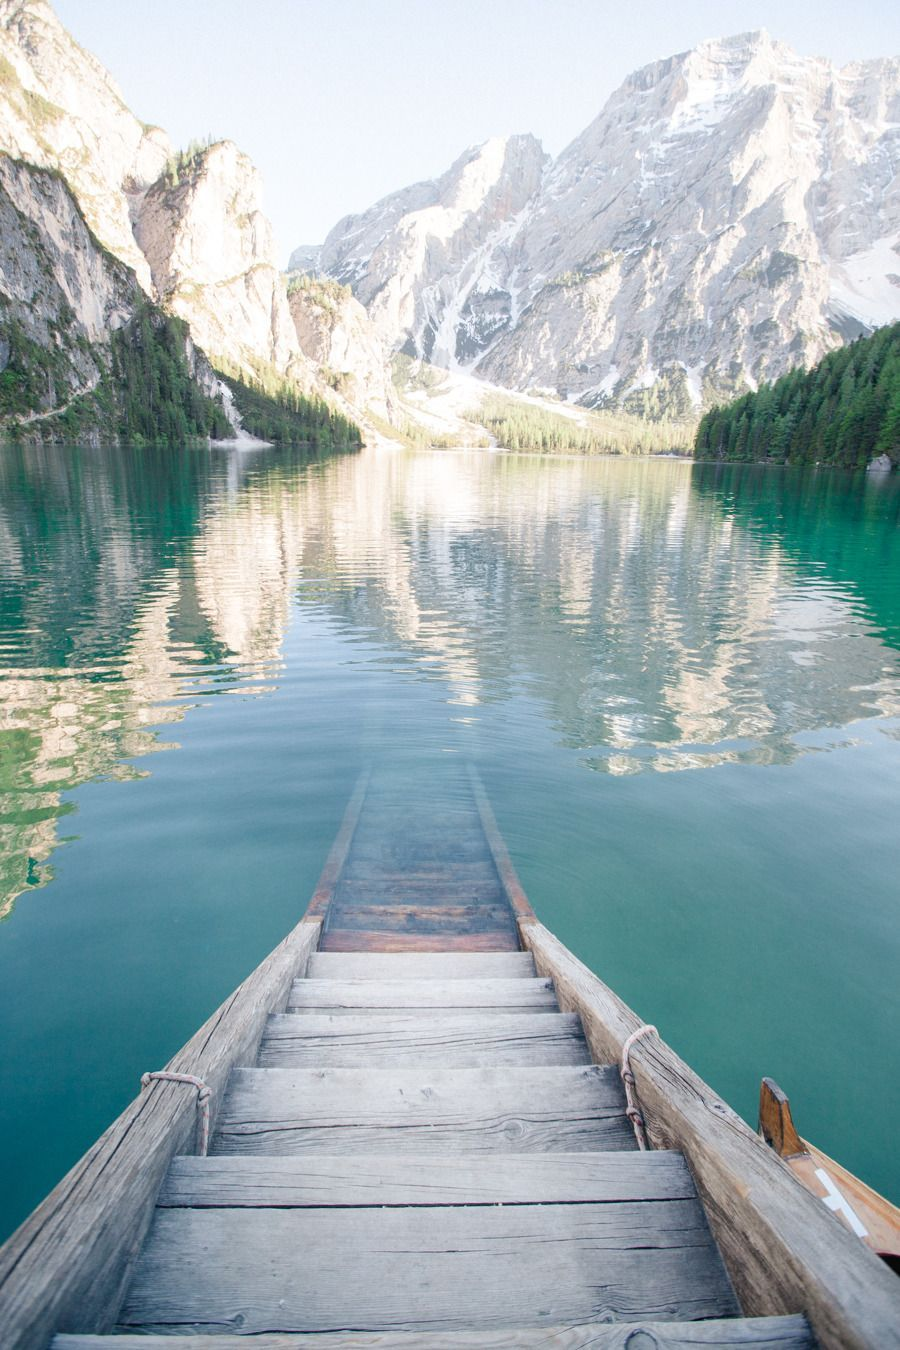 Enchanting Italian Lake Engagement #prettyplaces Die Treppe, die unter Wasser f…